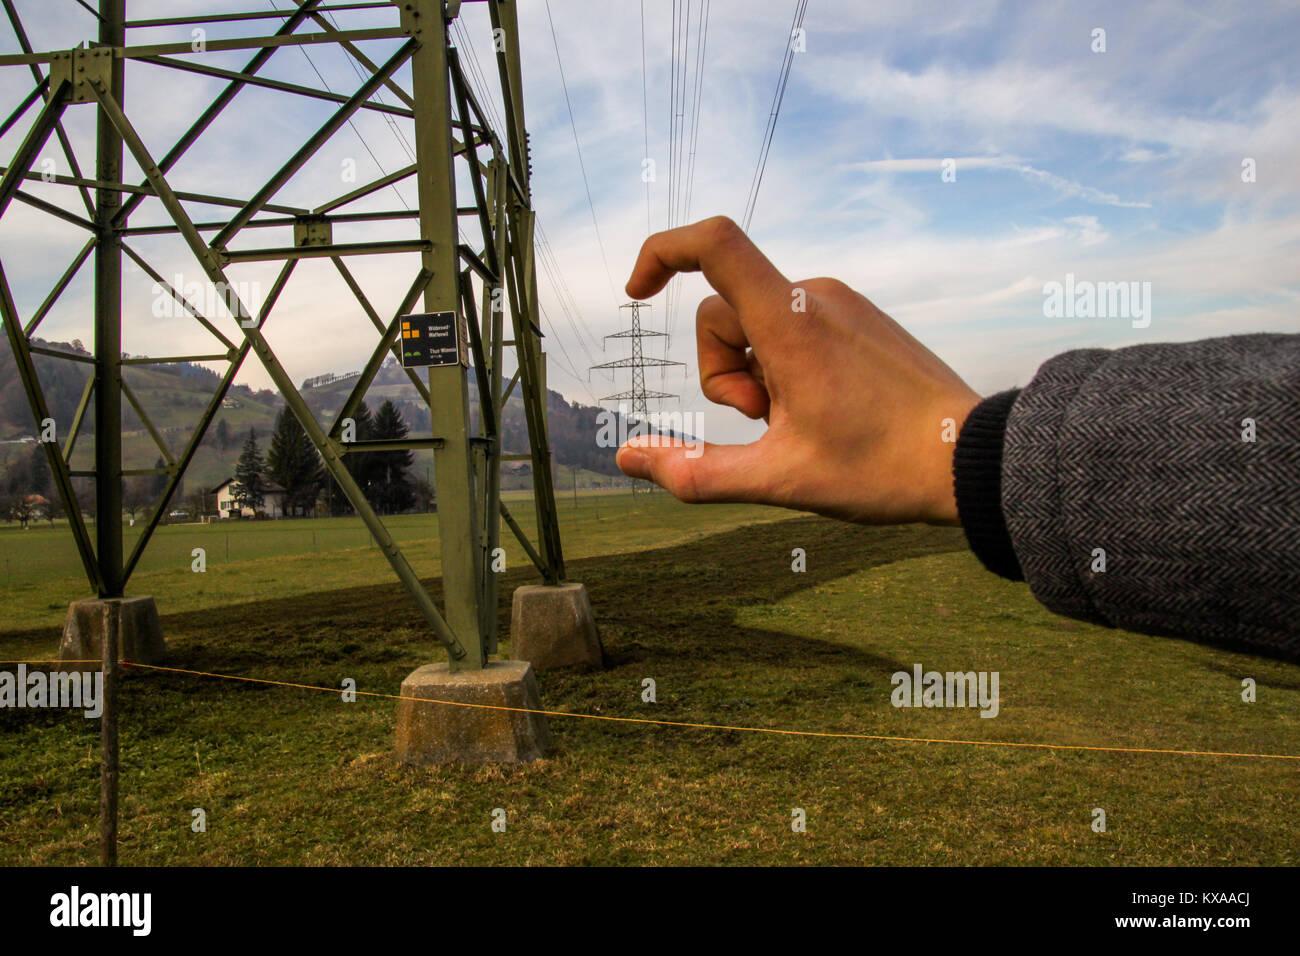 Man Holding Powerlines - Stock Image